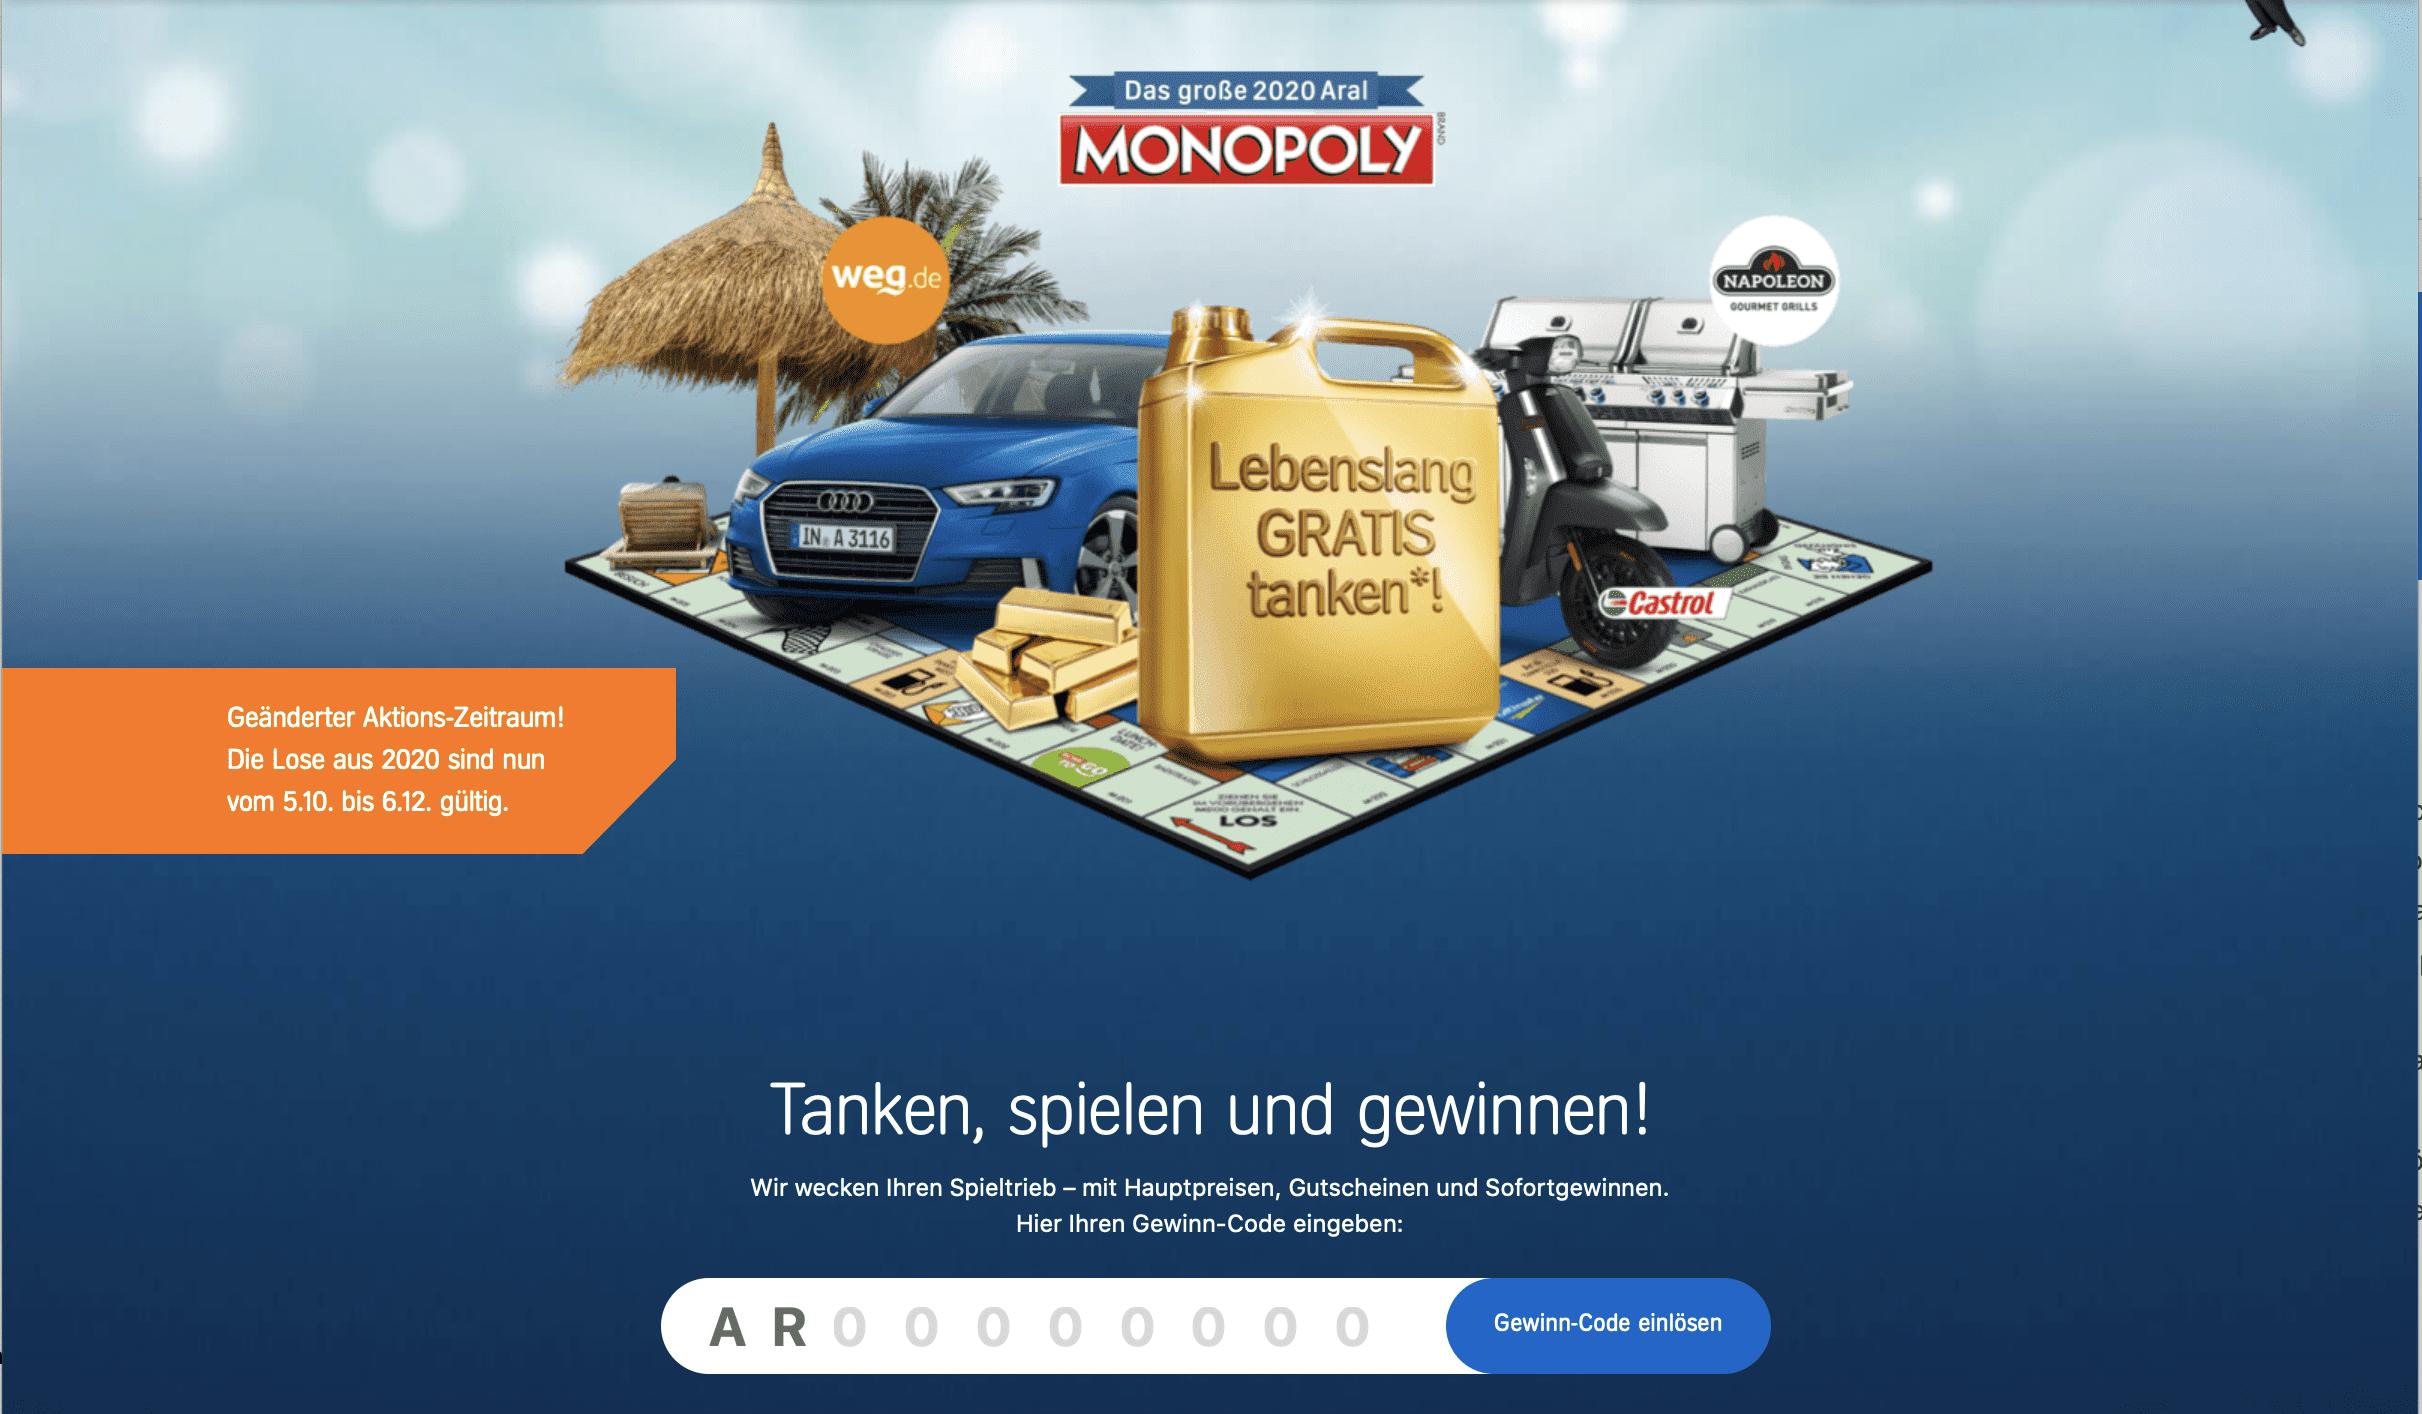 Aral Monopoly 2020 Code-Gewinnspiel mit PAYBACK